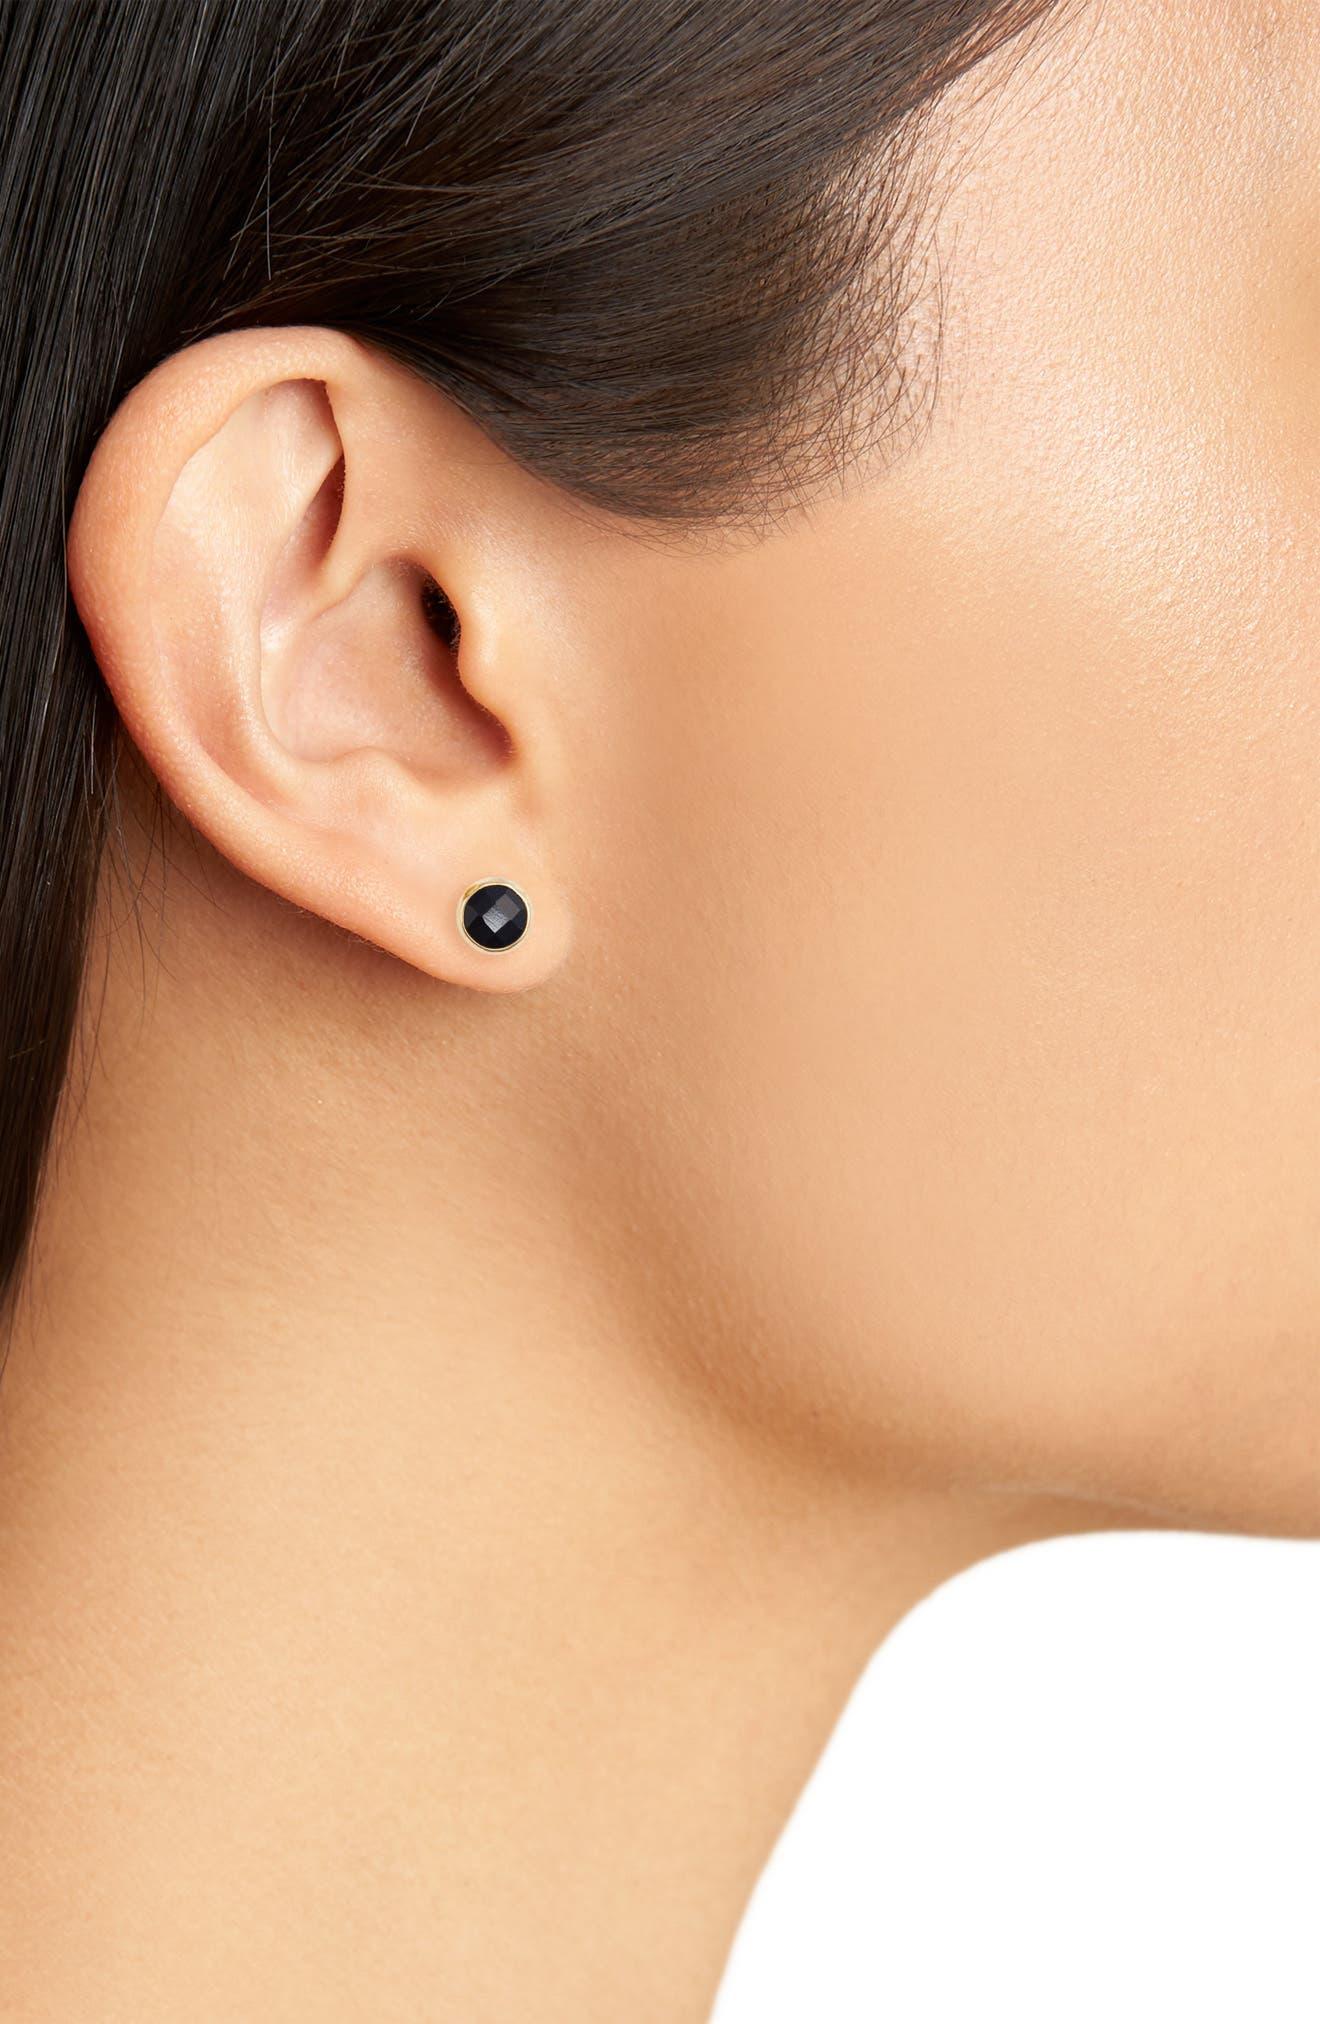 GORJANA, Protection Stud Earrings, Alternate thumbnail 2, color, PROTECTION/ BLACK ONYX/ GOLD